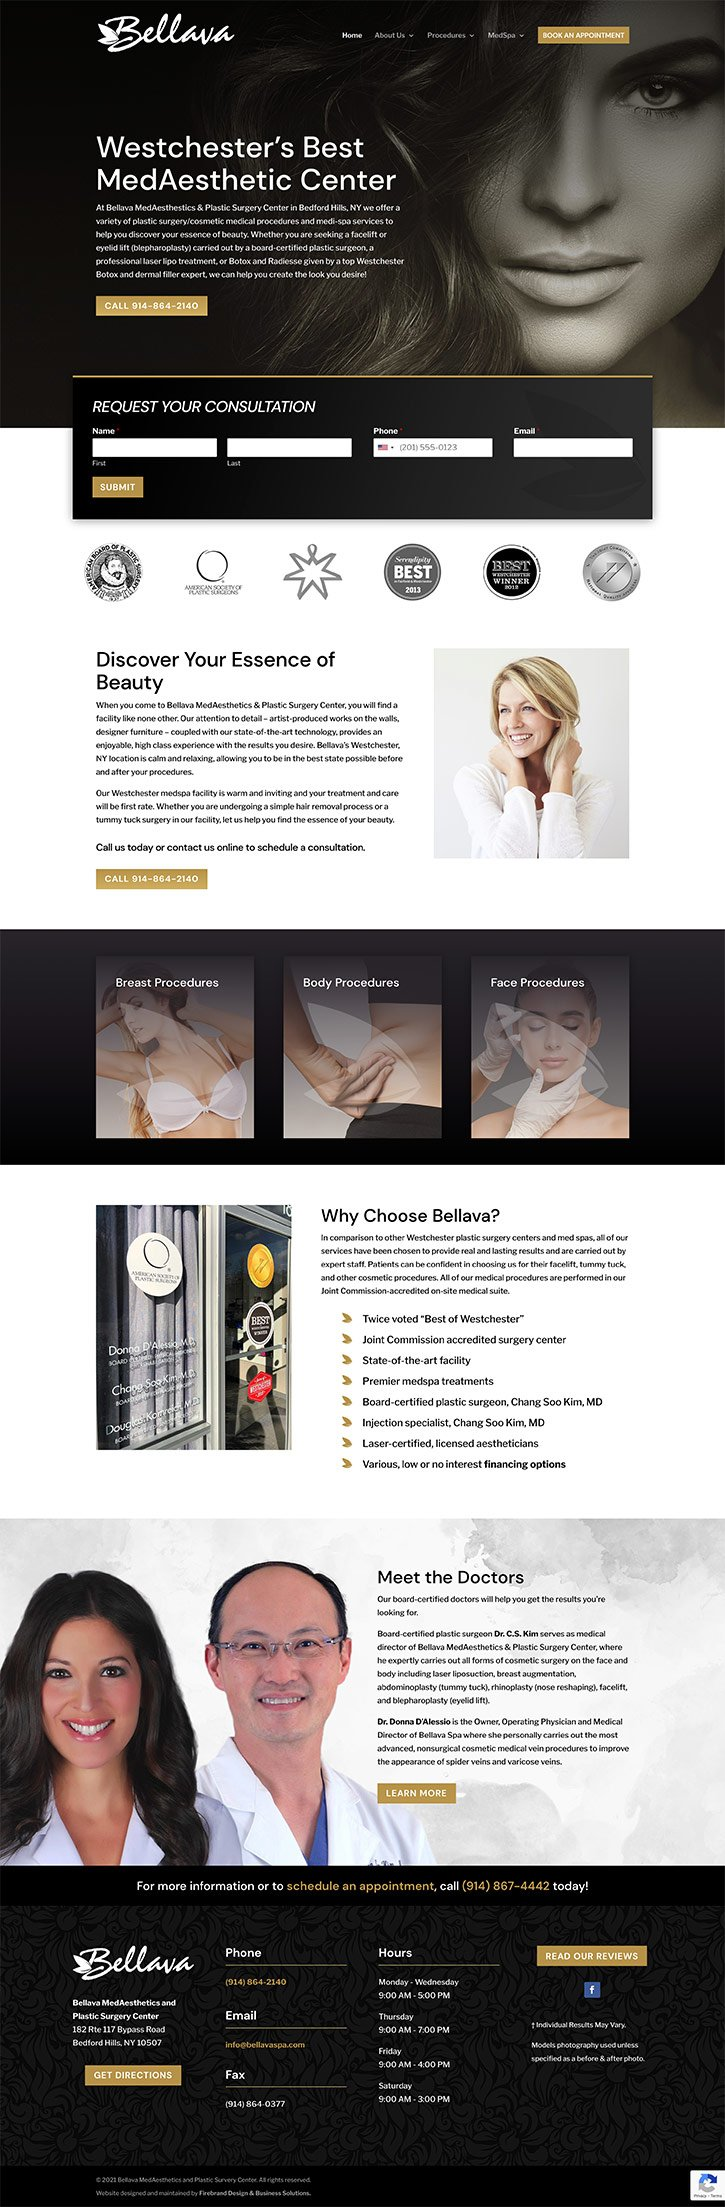 Bellava MedAesthetics and Plastic Surgery Center website Firebrand Design & Business Solutions in Safety Harbor, FL